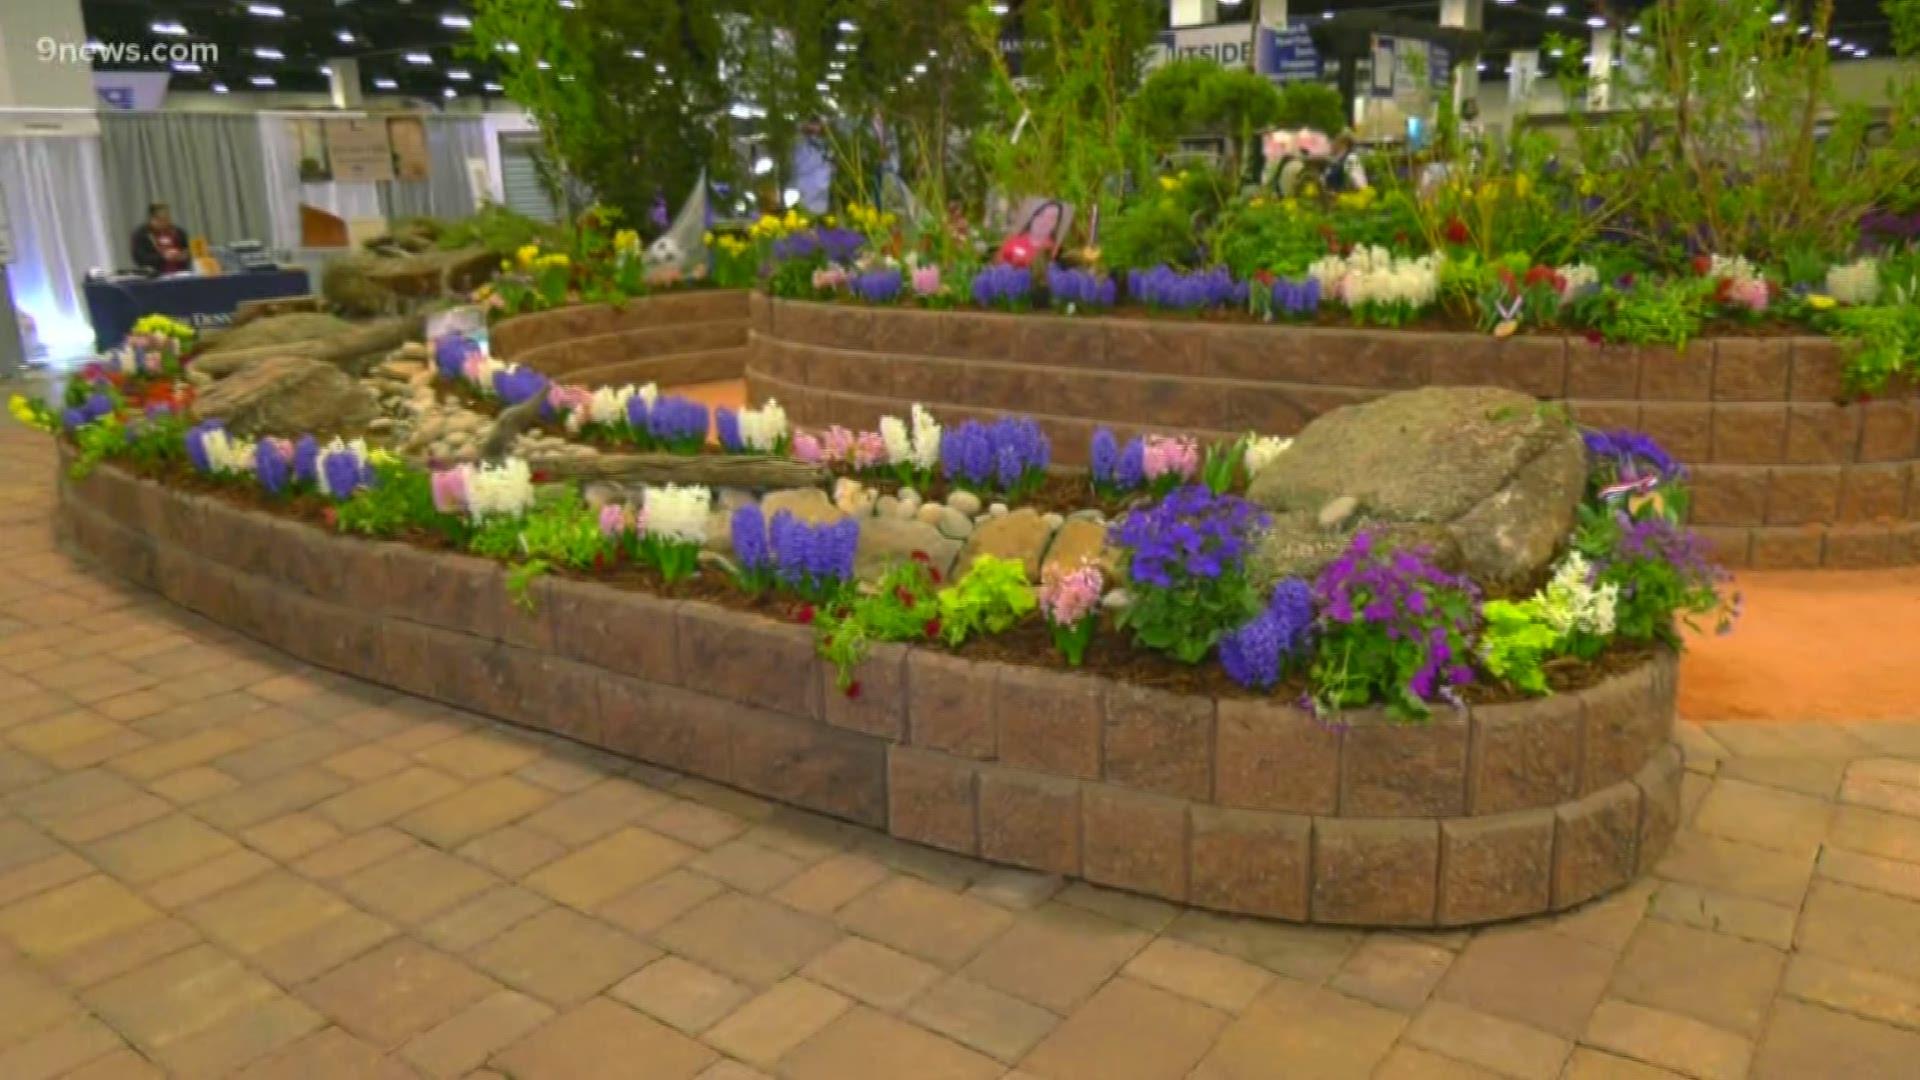 Colorado Garden Home Show 2020 Opens Feb 22 Wusa9 Com